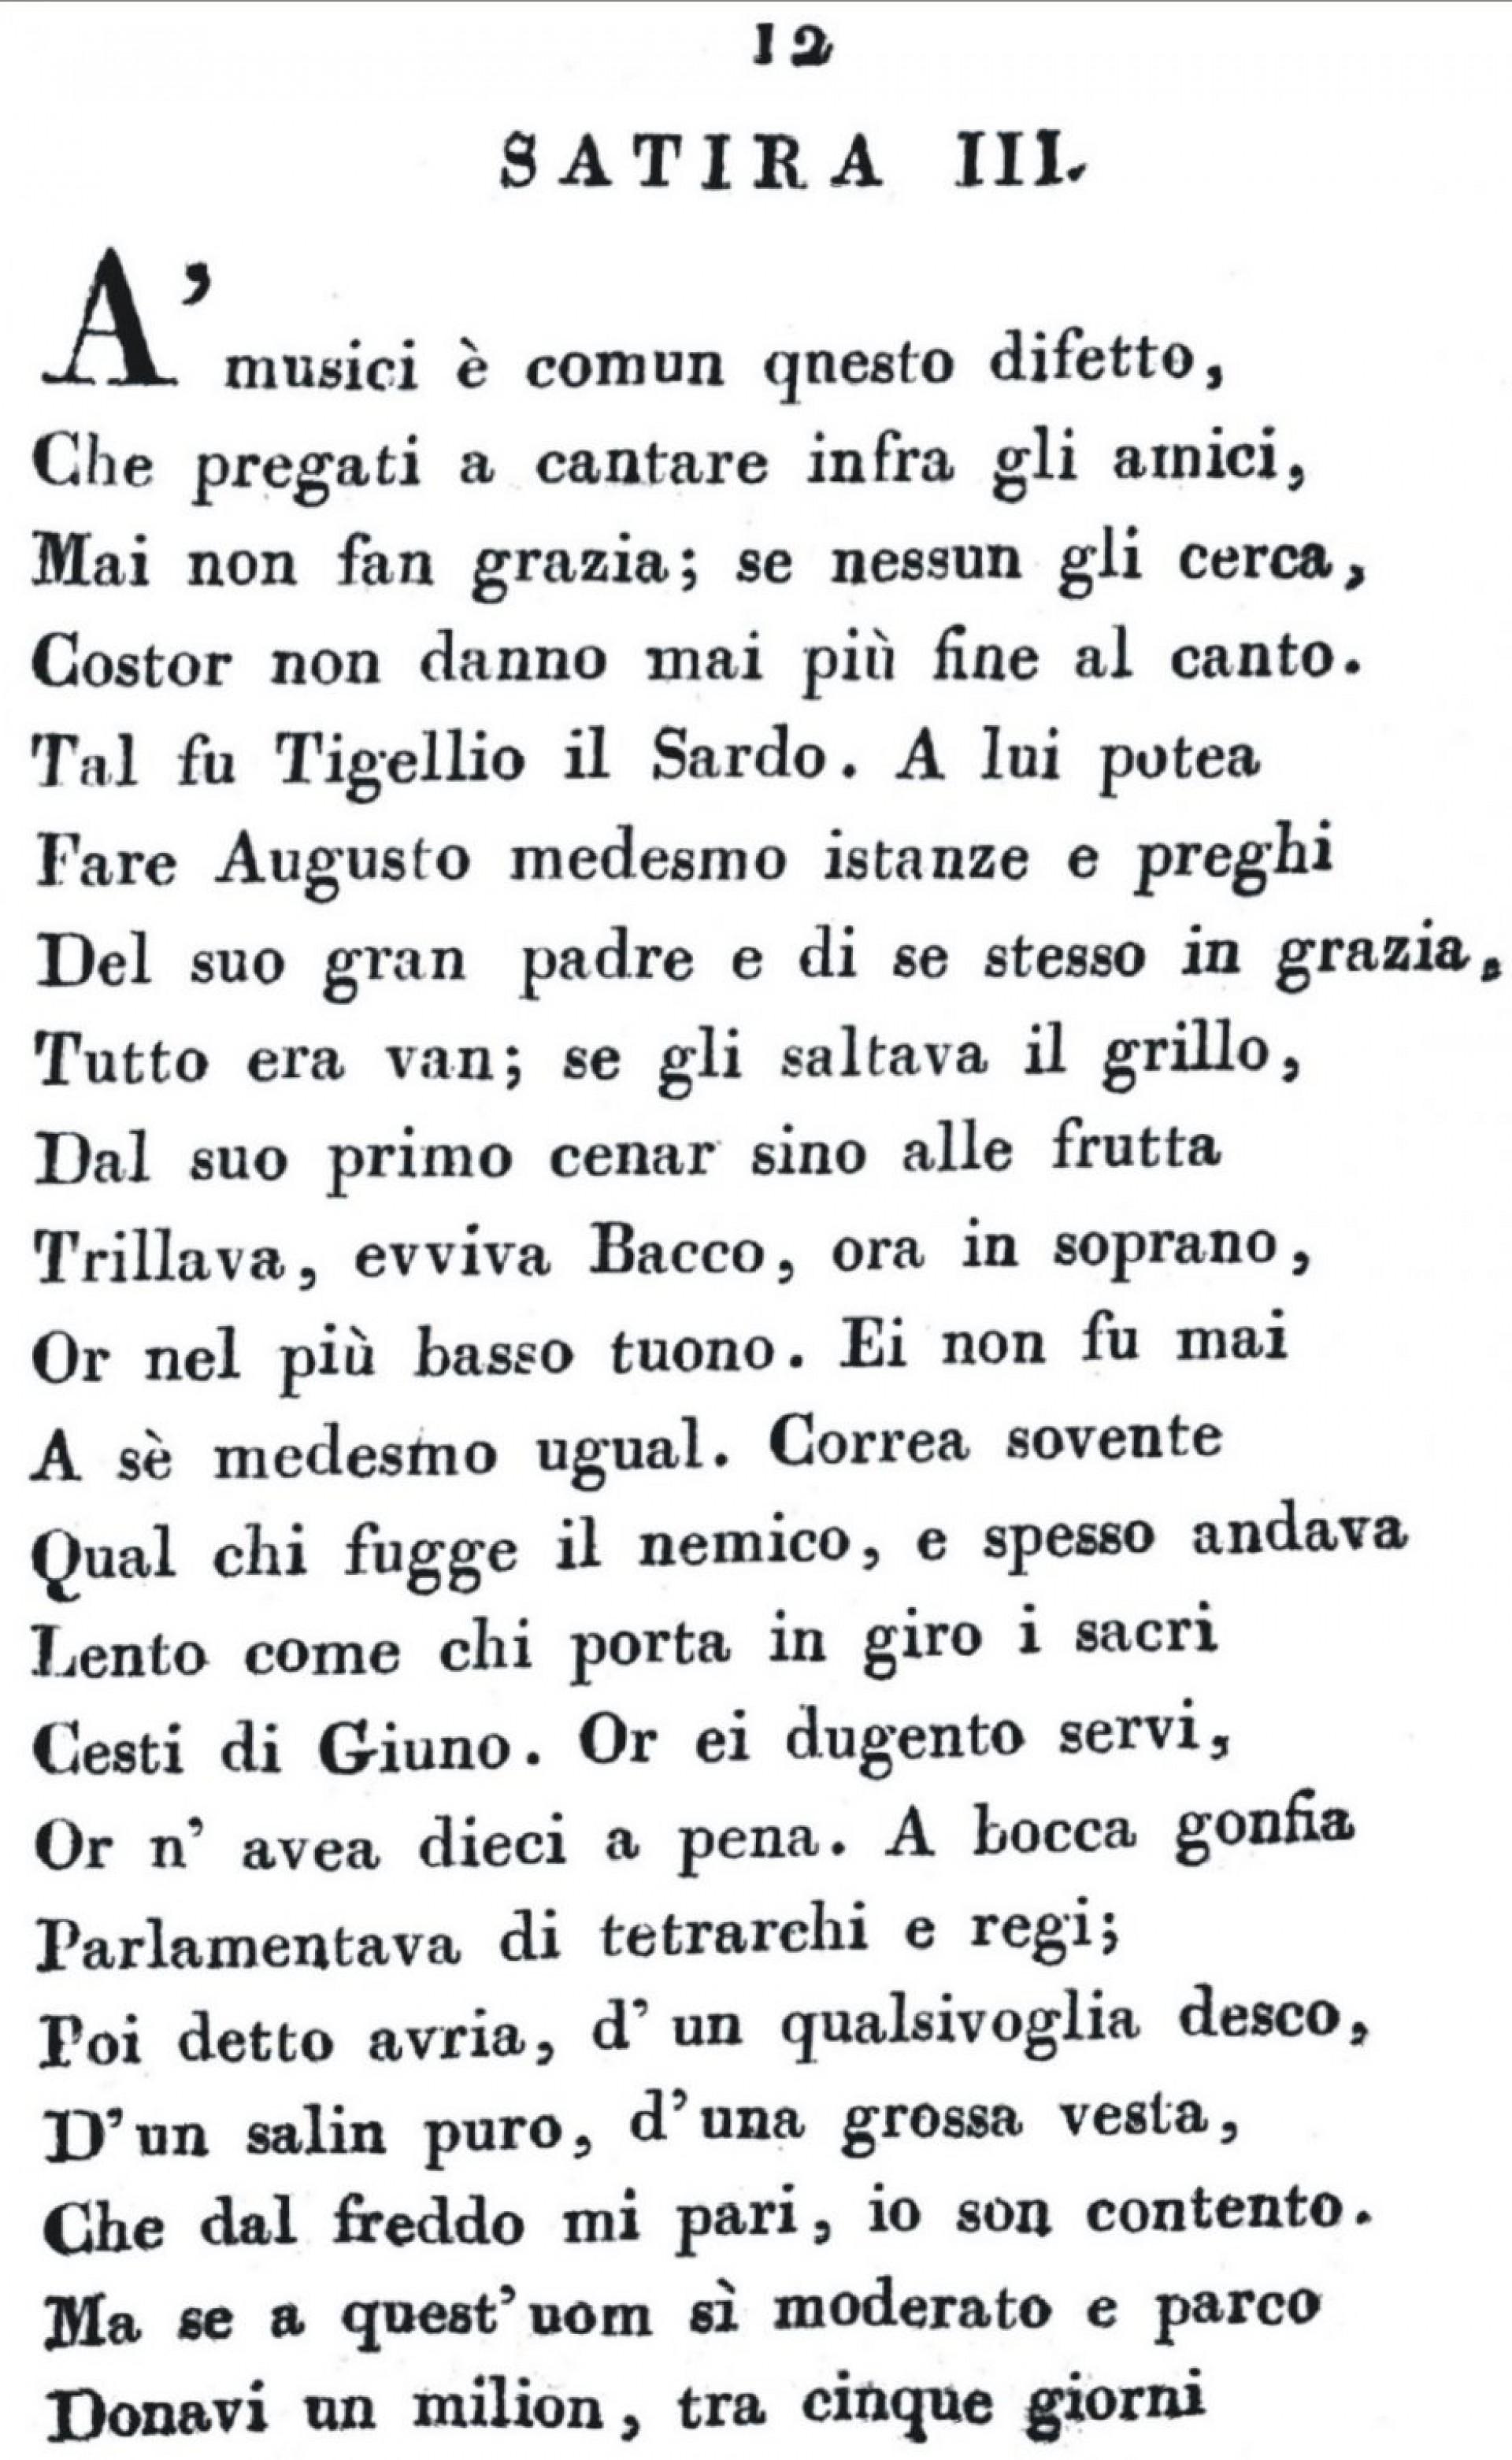 007 Satire Essays School Orazio Pag Essay On Uniforms High Dress Code Education Lunch 936x1523 Beautiful 1920